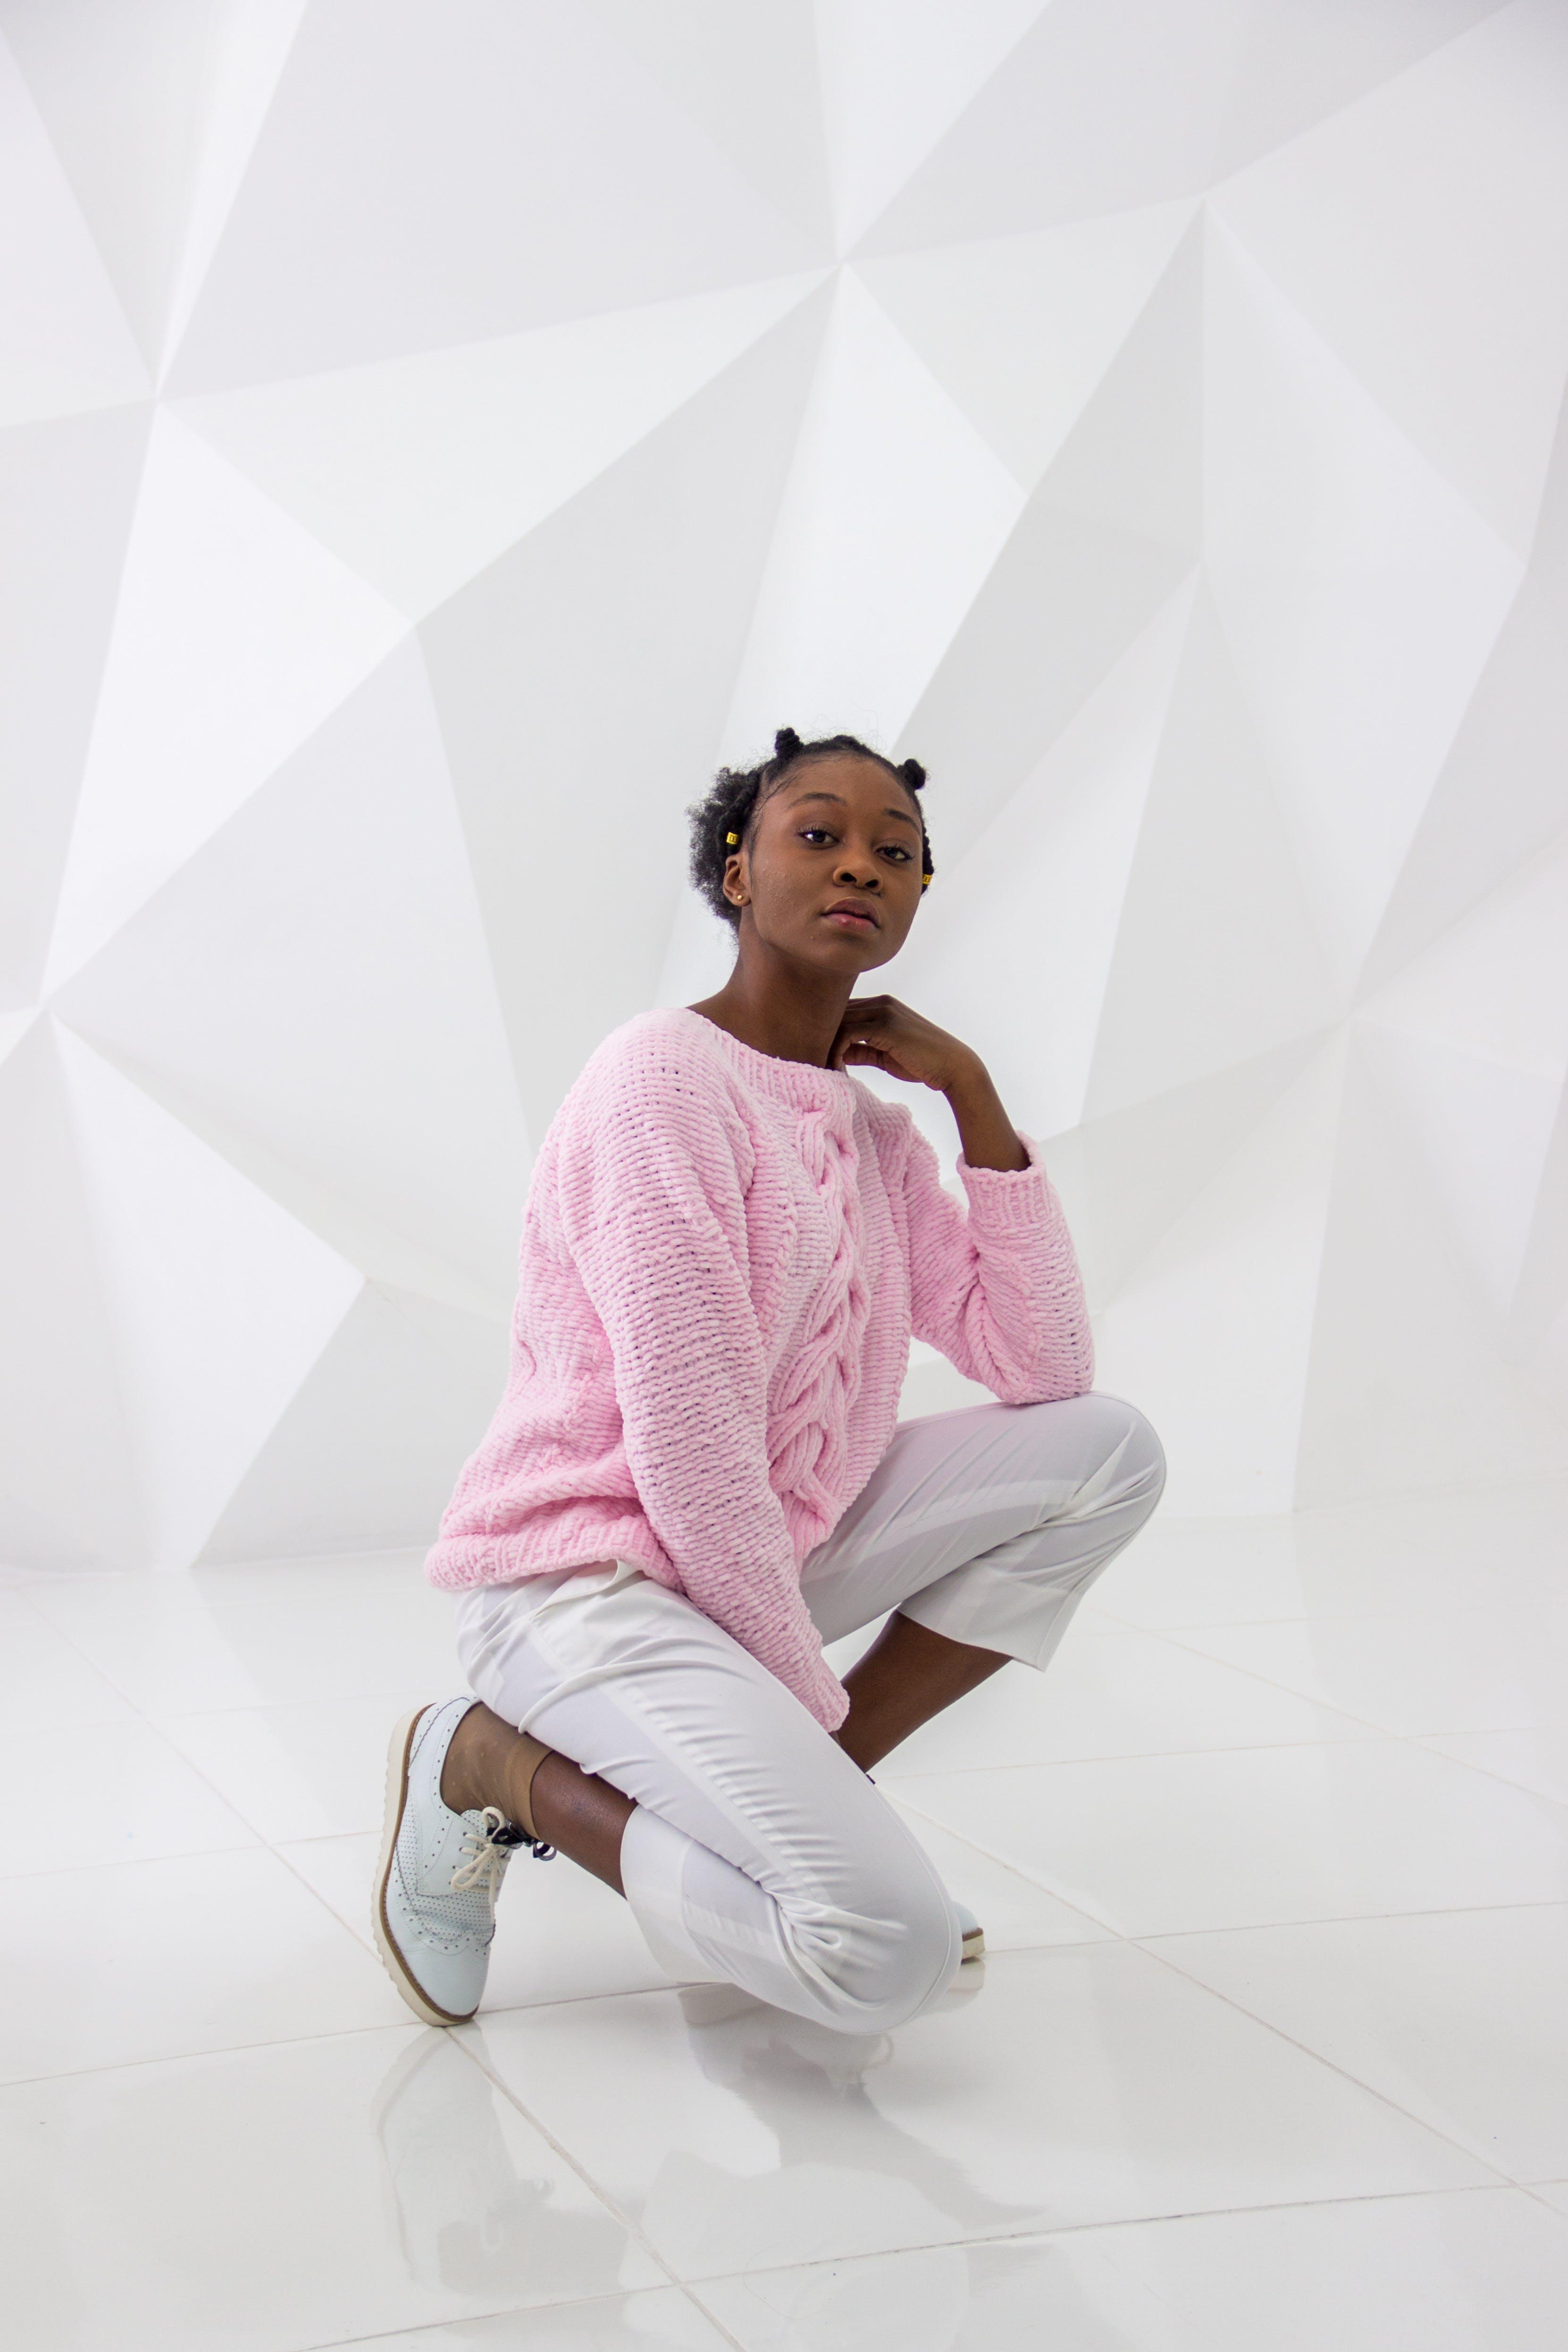 Woman Wearing Pink Sweater and White Pants Posing